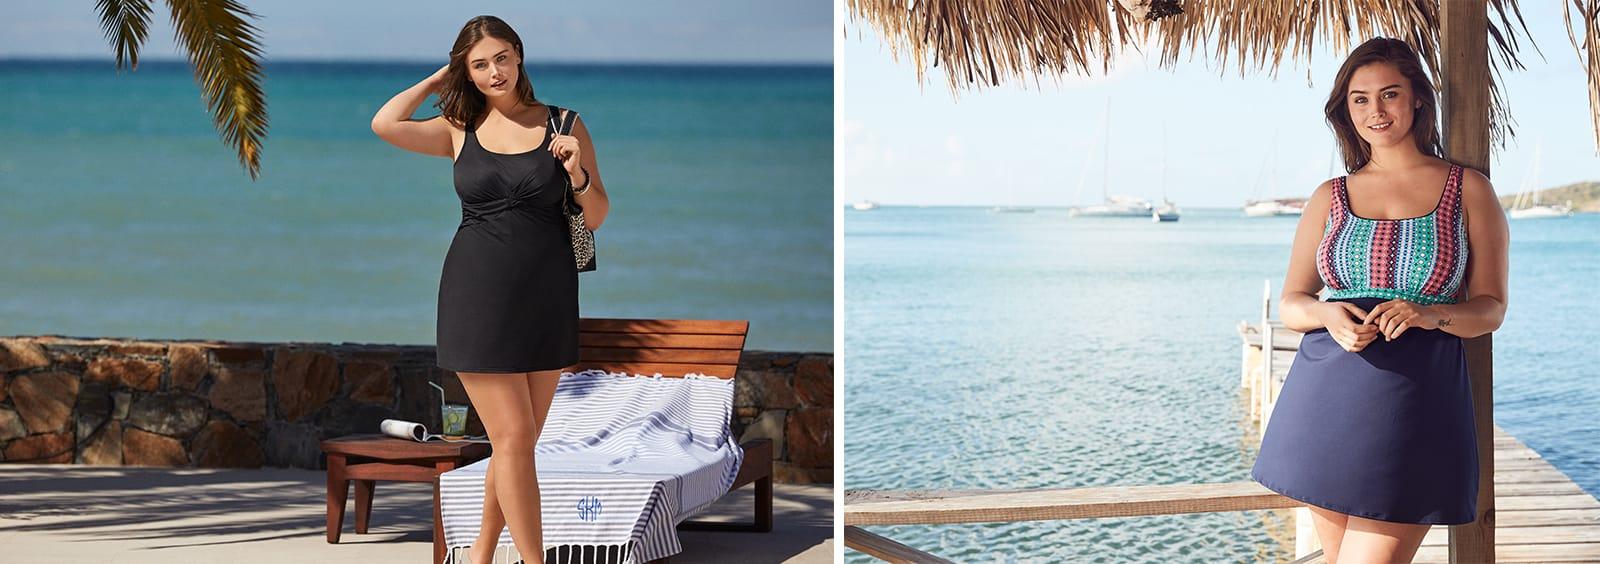 Are Swim Dresses Good for Curvy Figures?